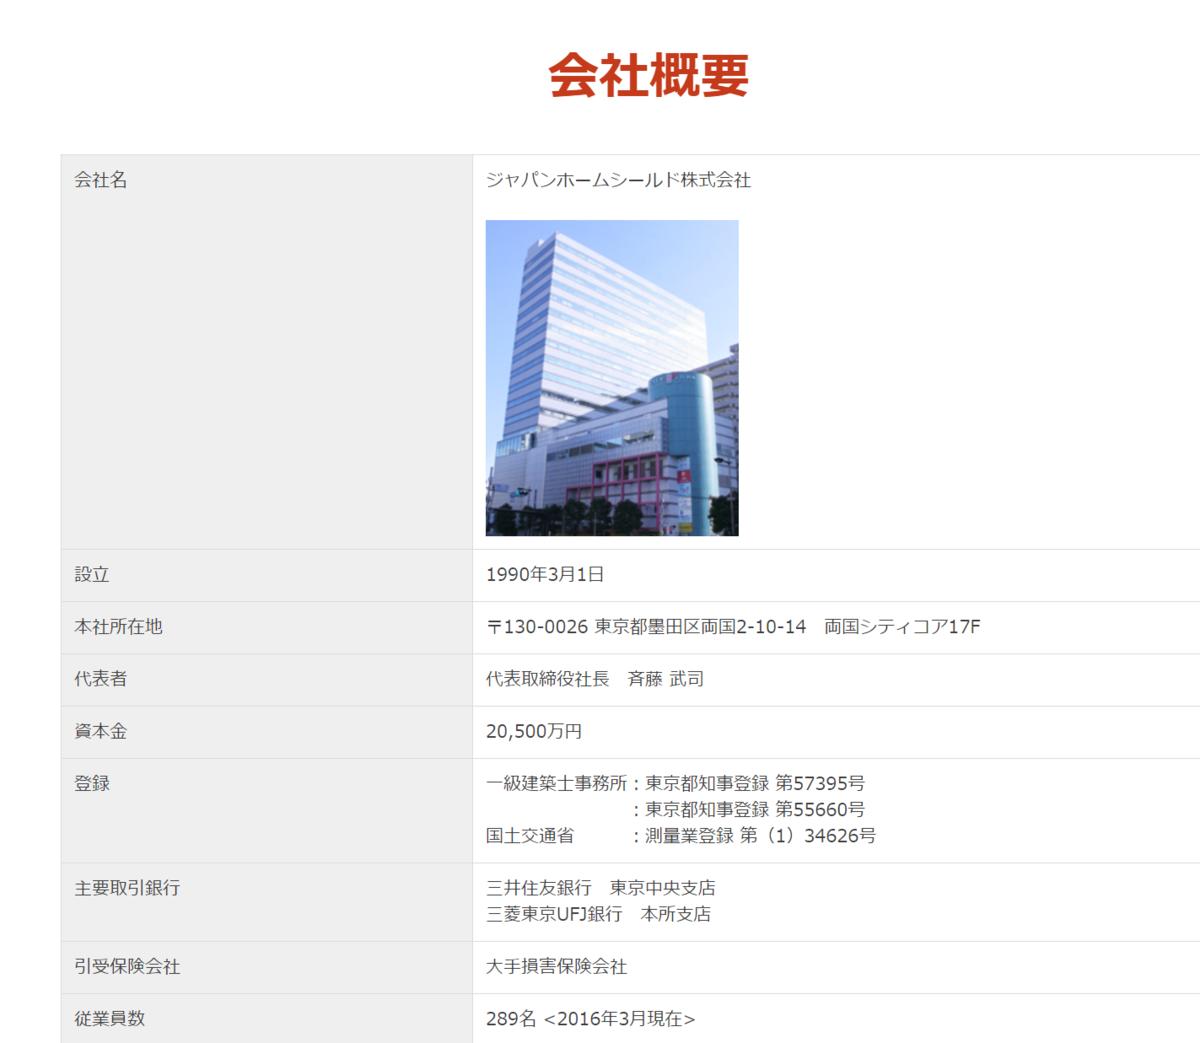 f:id:itosama:20200302192801p:plain